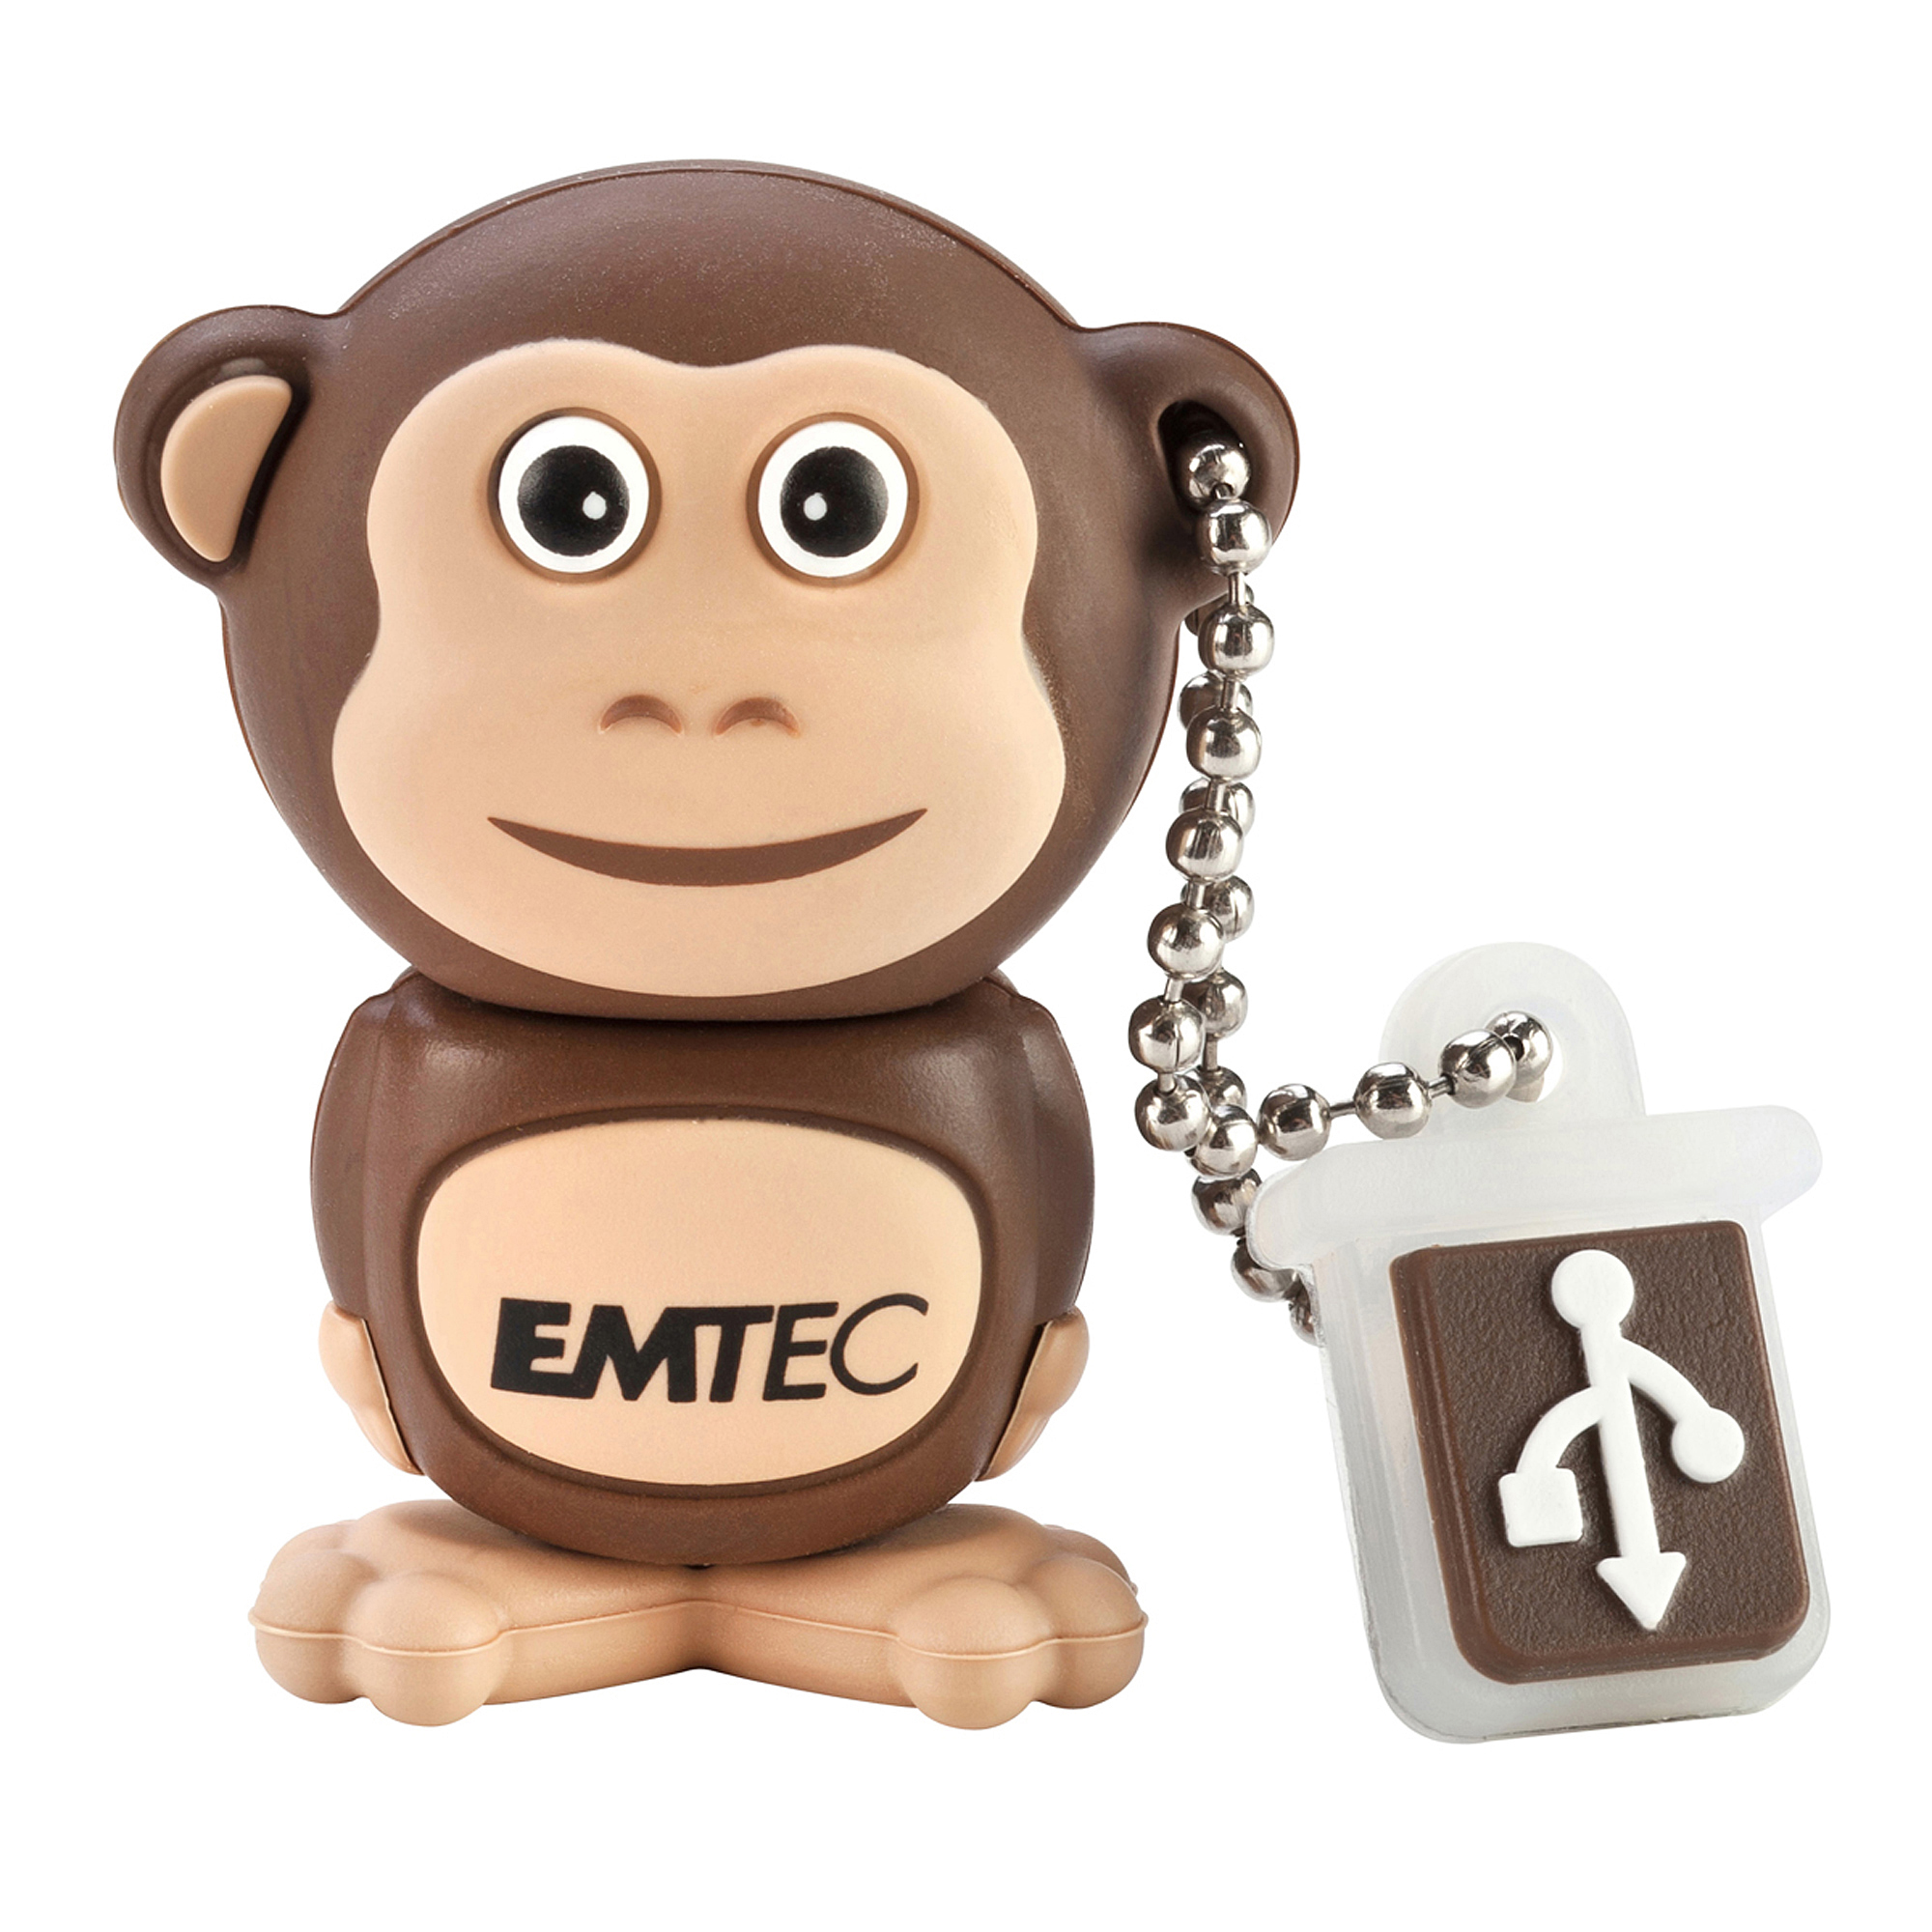 Emtec Animal Design USB 2.0 Flash Drive, 4GB, Monkey